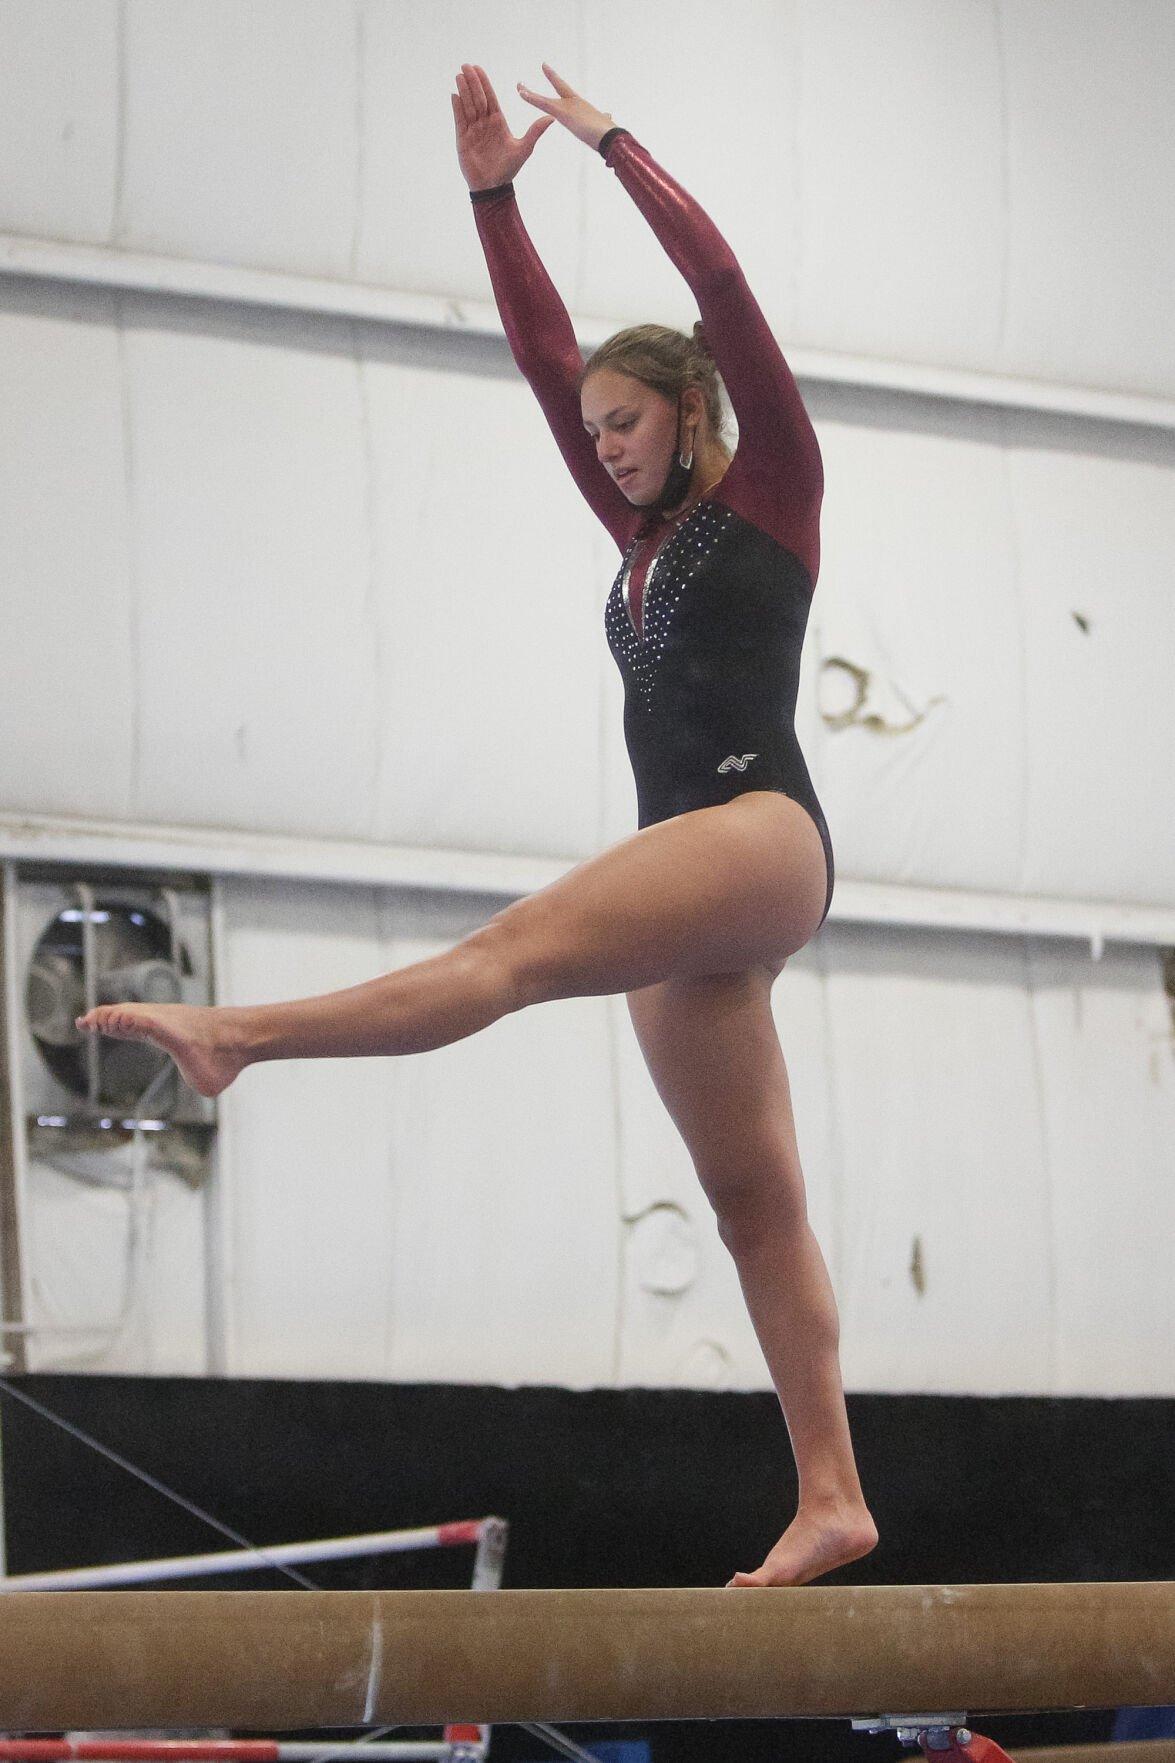 Scarsdale gymnastics